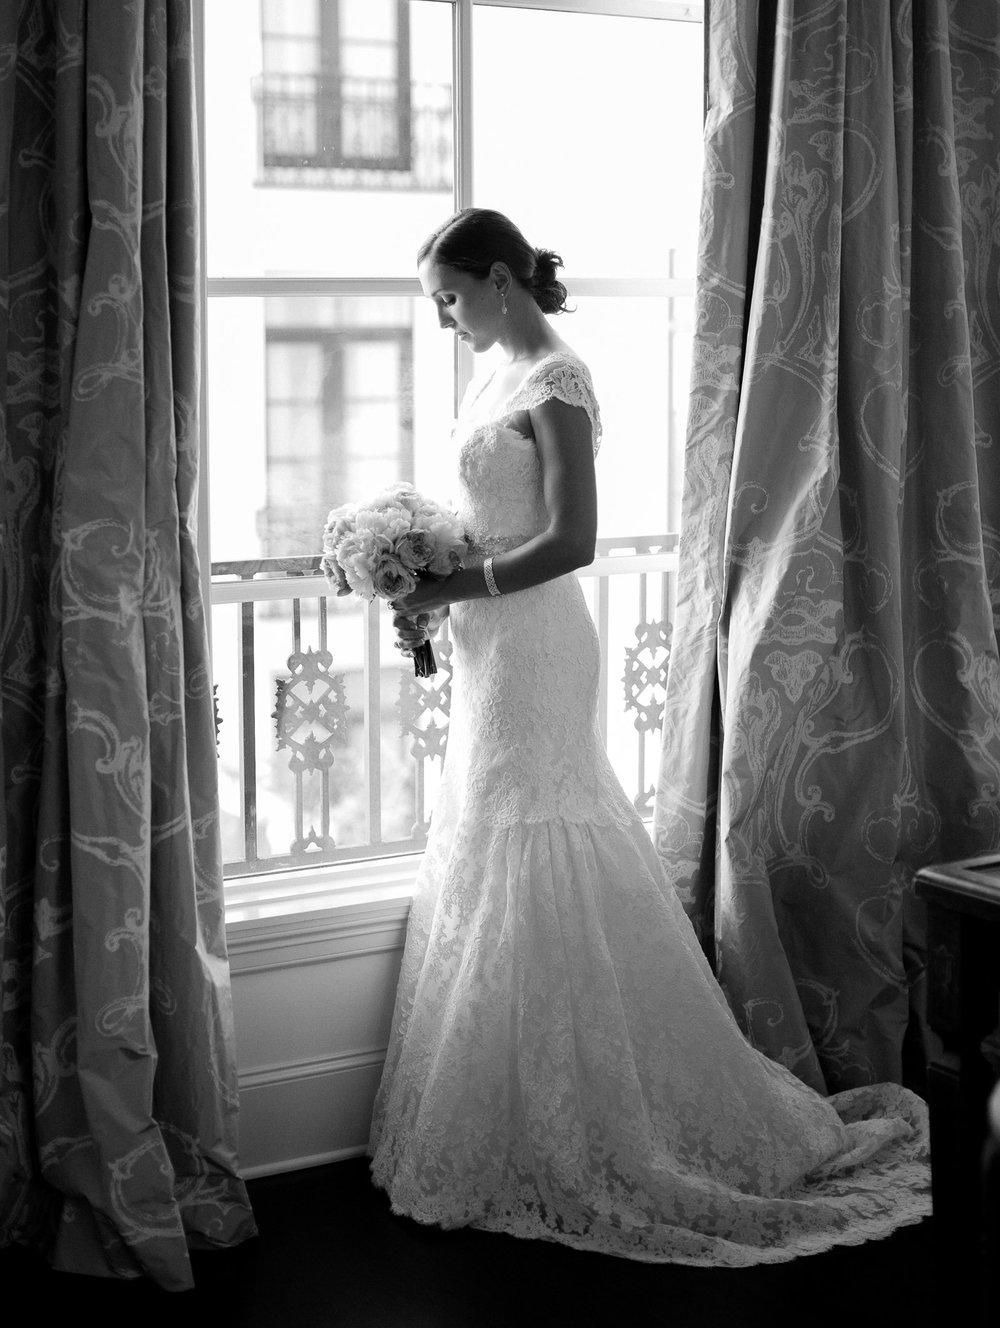 0022_0020_Houston-Film-Bridal-Black-and-White-Portrait.jpg